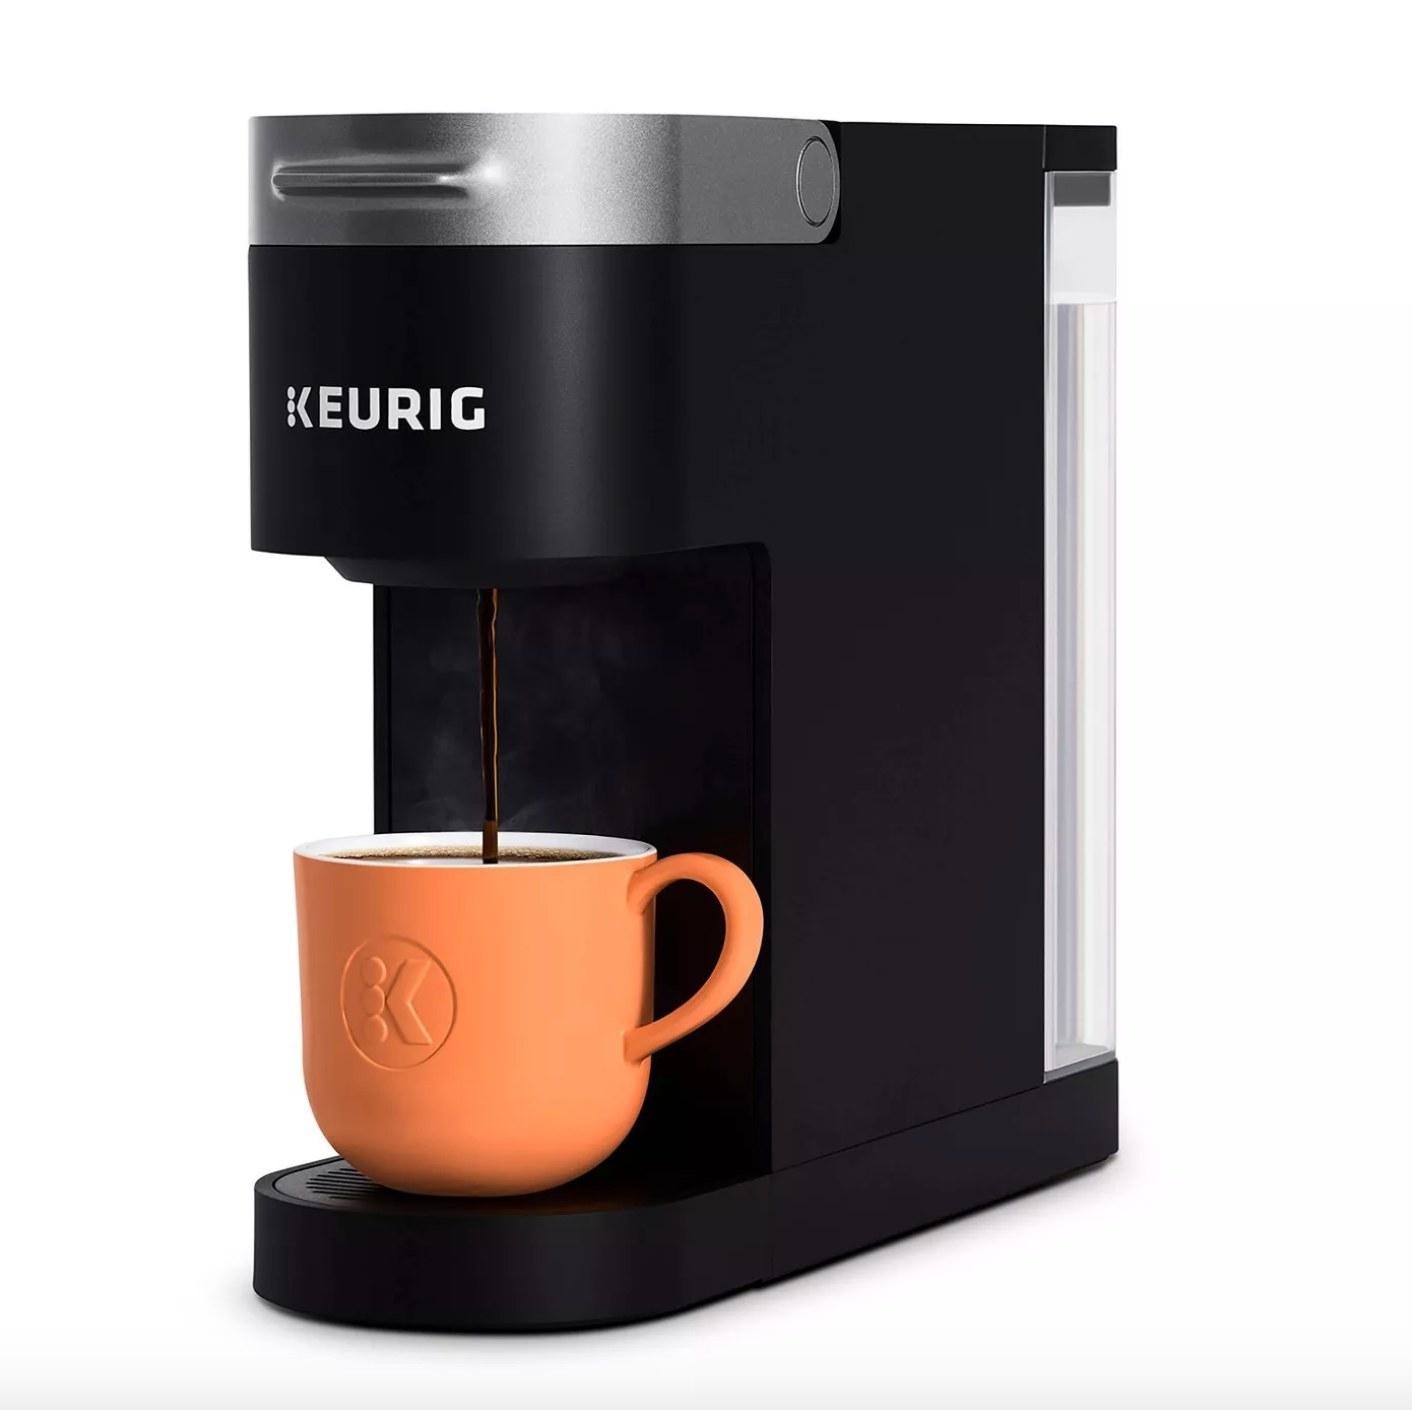 The single pod coffee maker